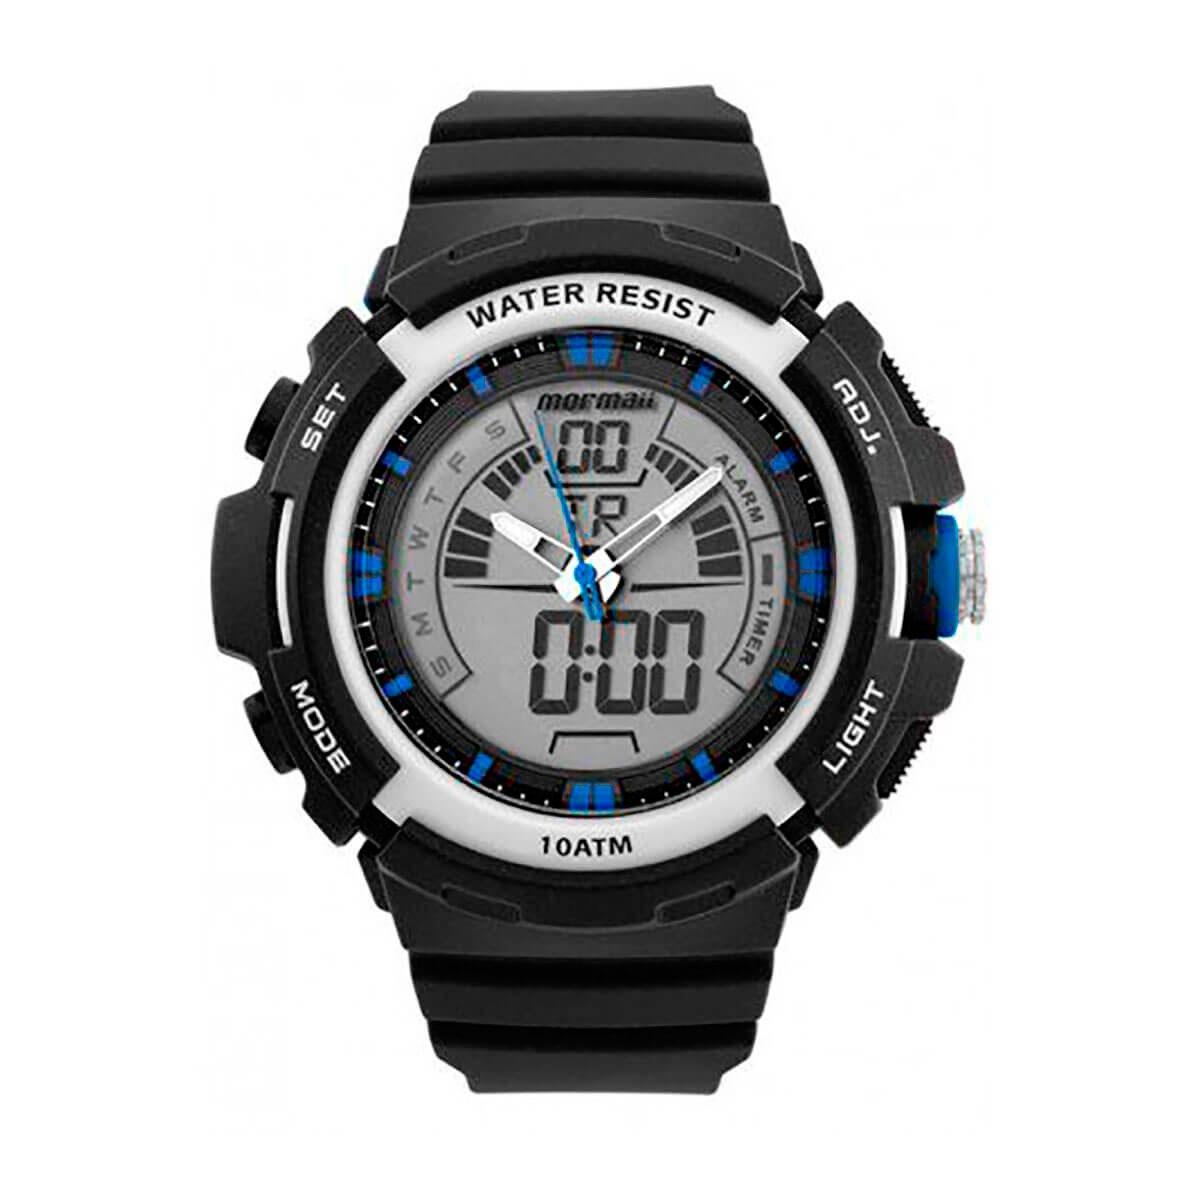 743cb94859e14 Relógio Mormaii Wave Masculino Moad08902 8a - R  214